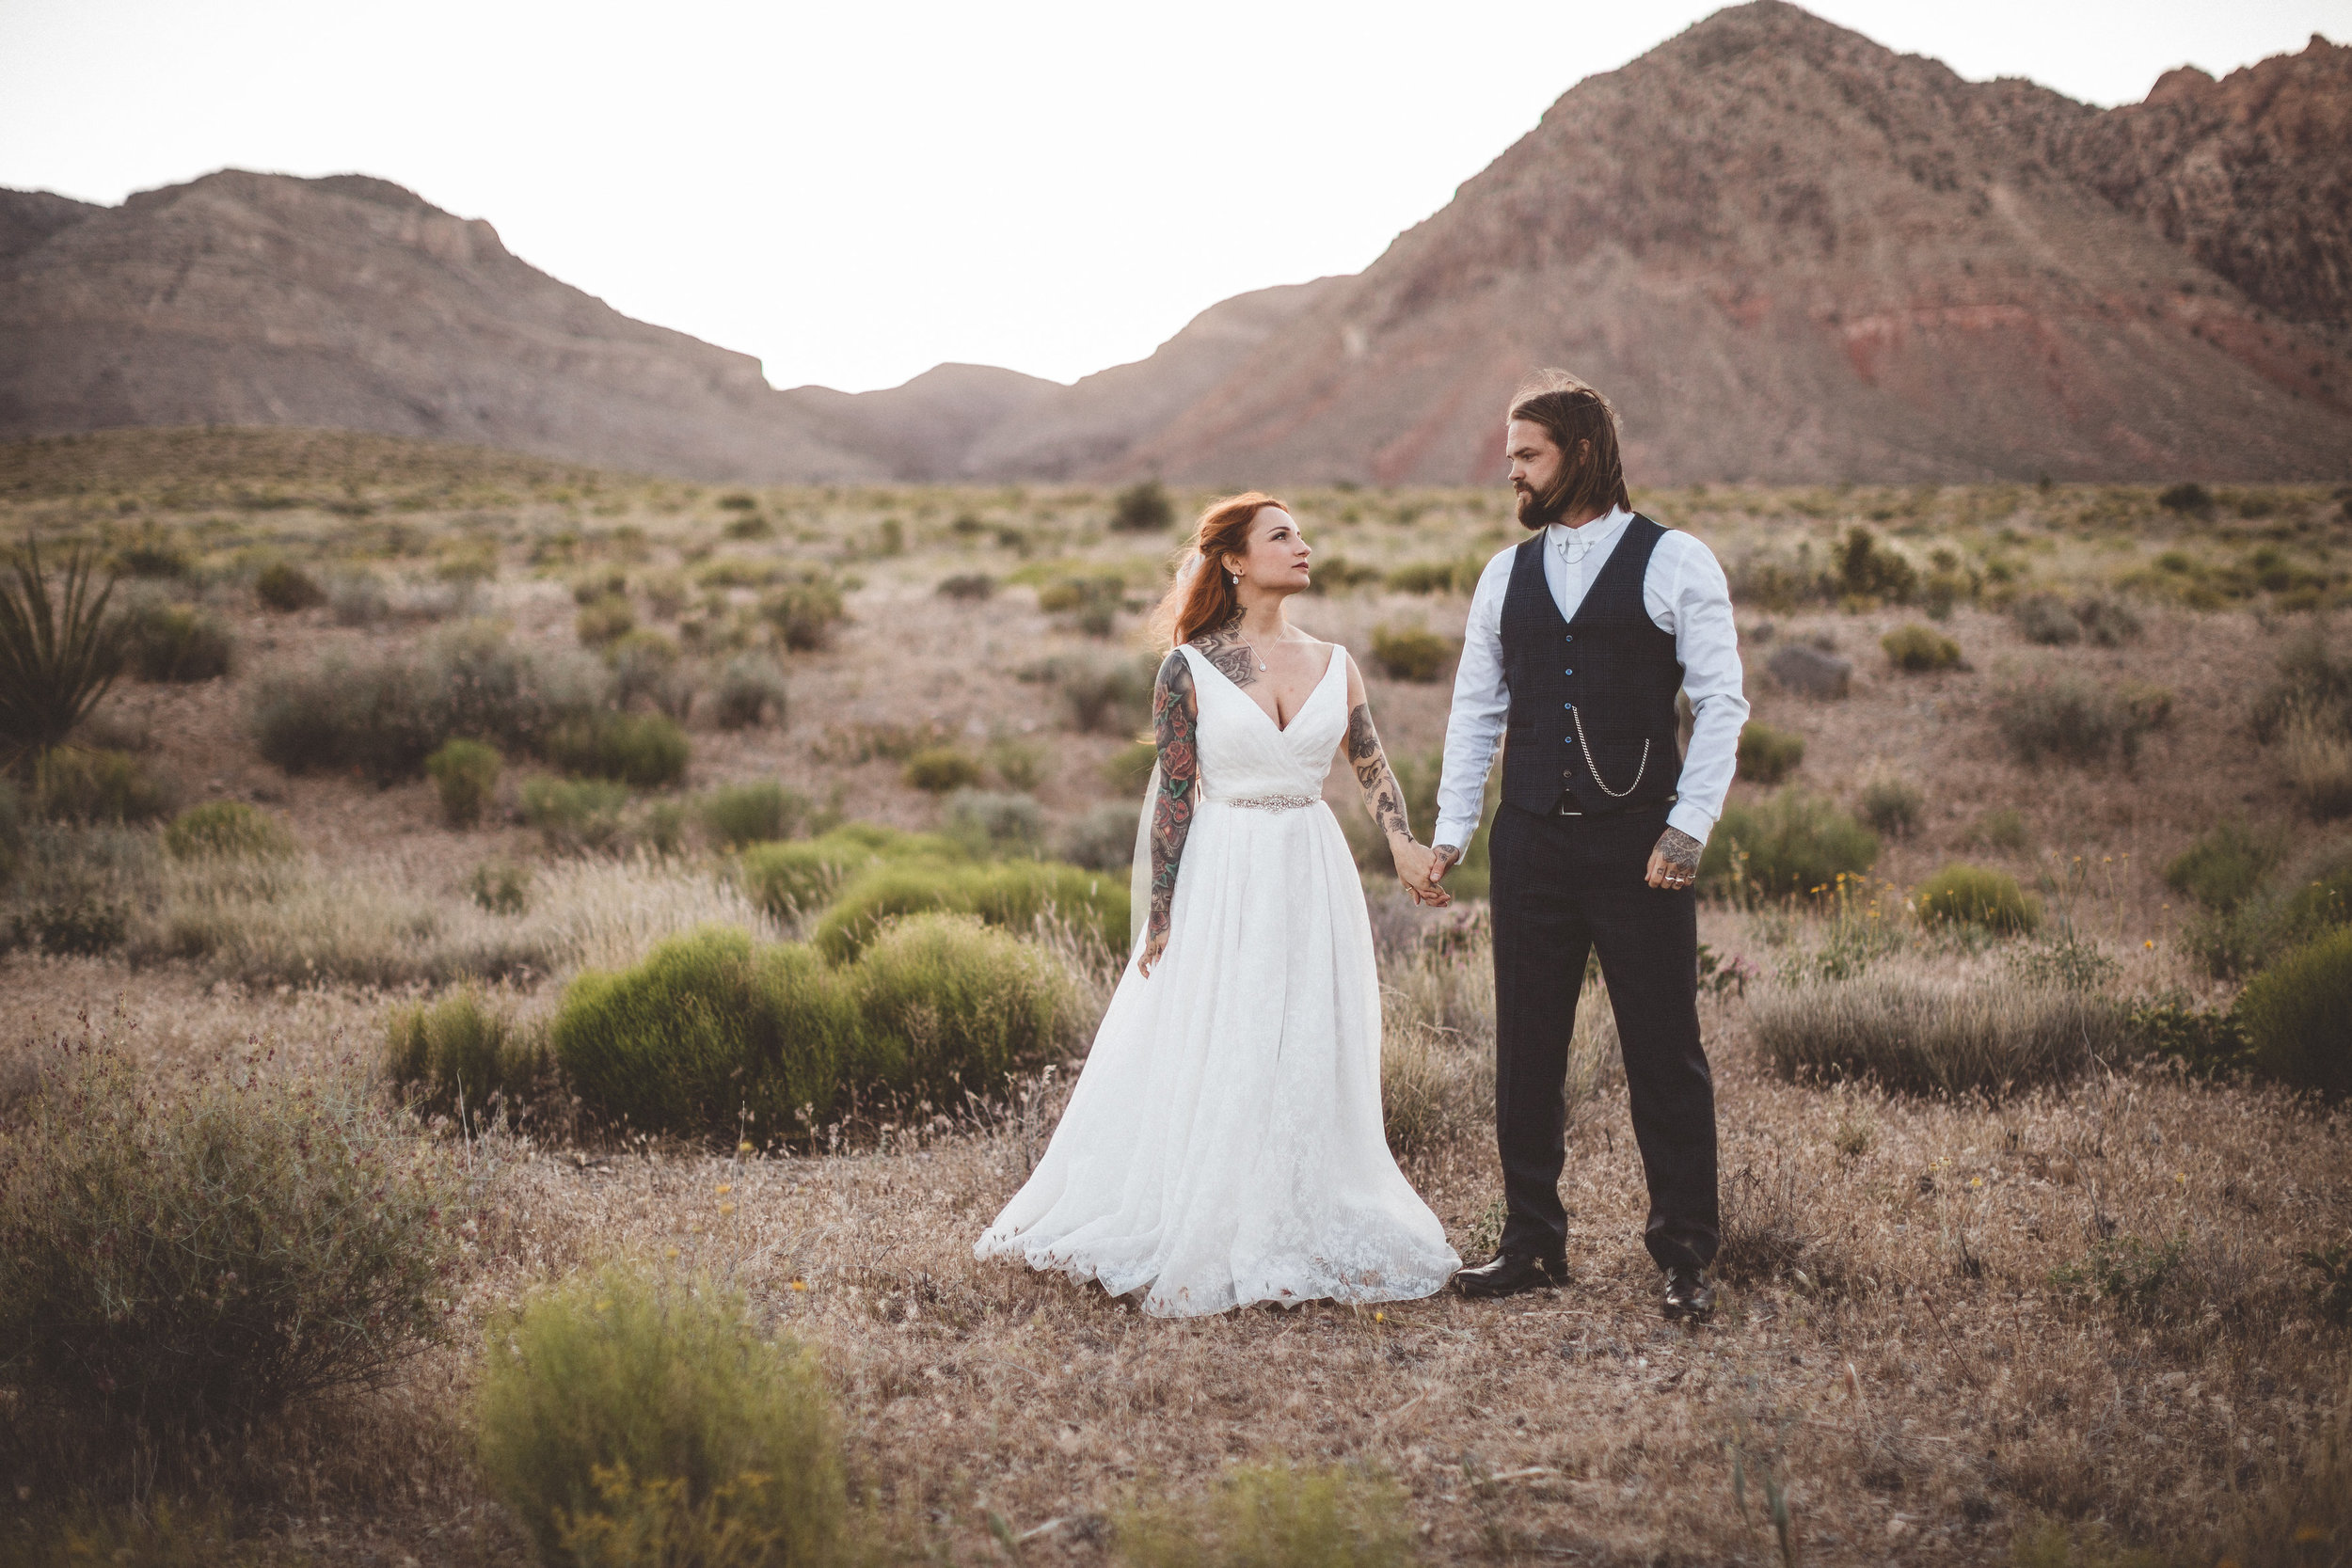 nicoletta-and-adams-rad-las-vegas-desert-elopement31.jpg